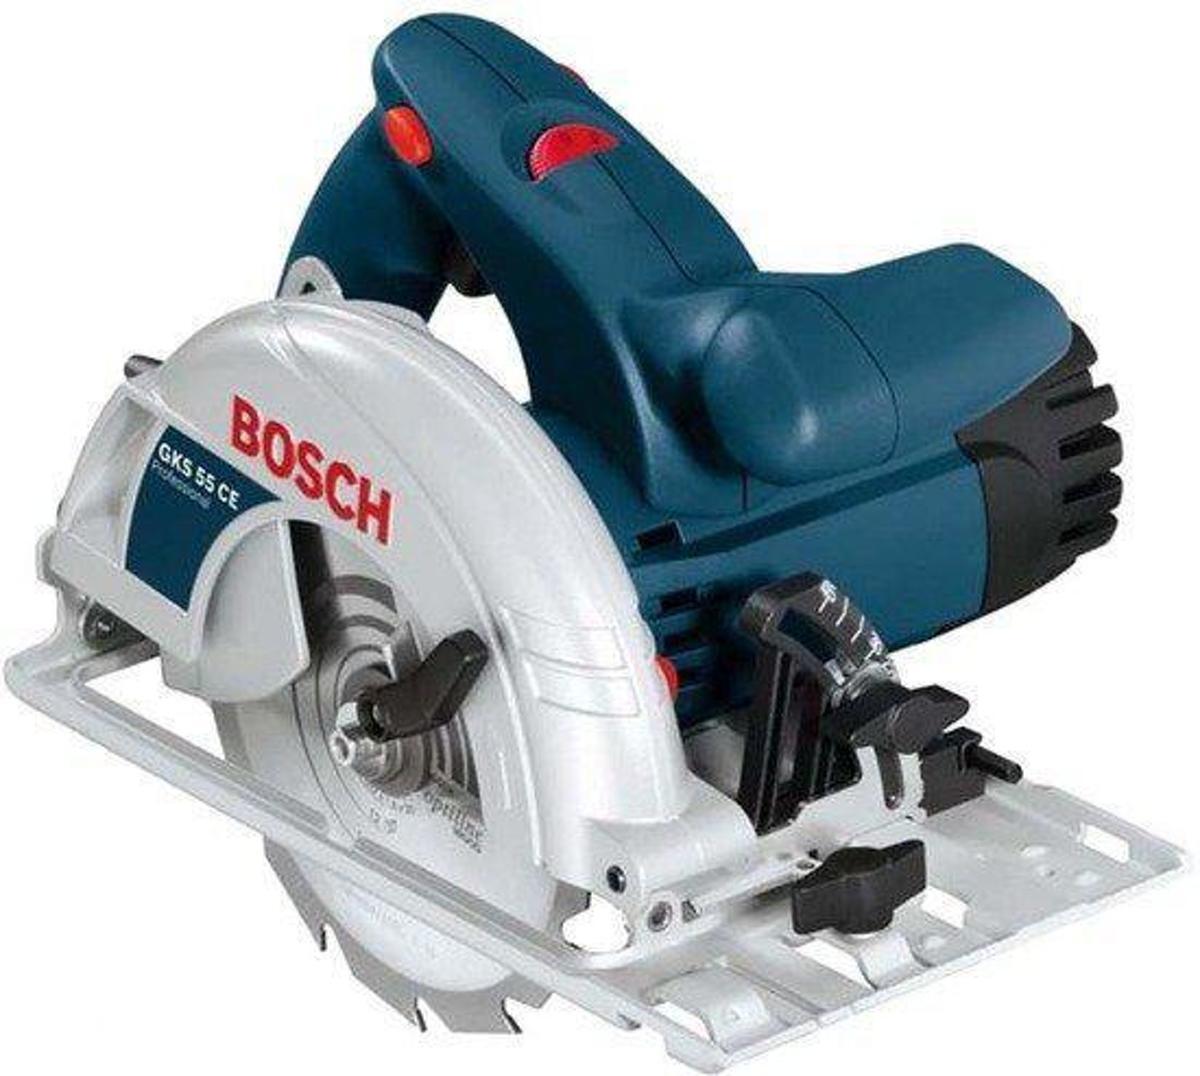 Bosch Cirkelzaag GKS55 160mm 1350Watt